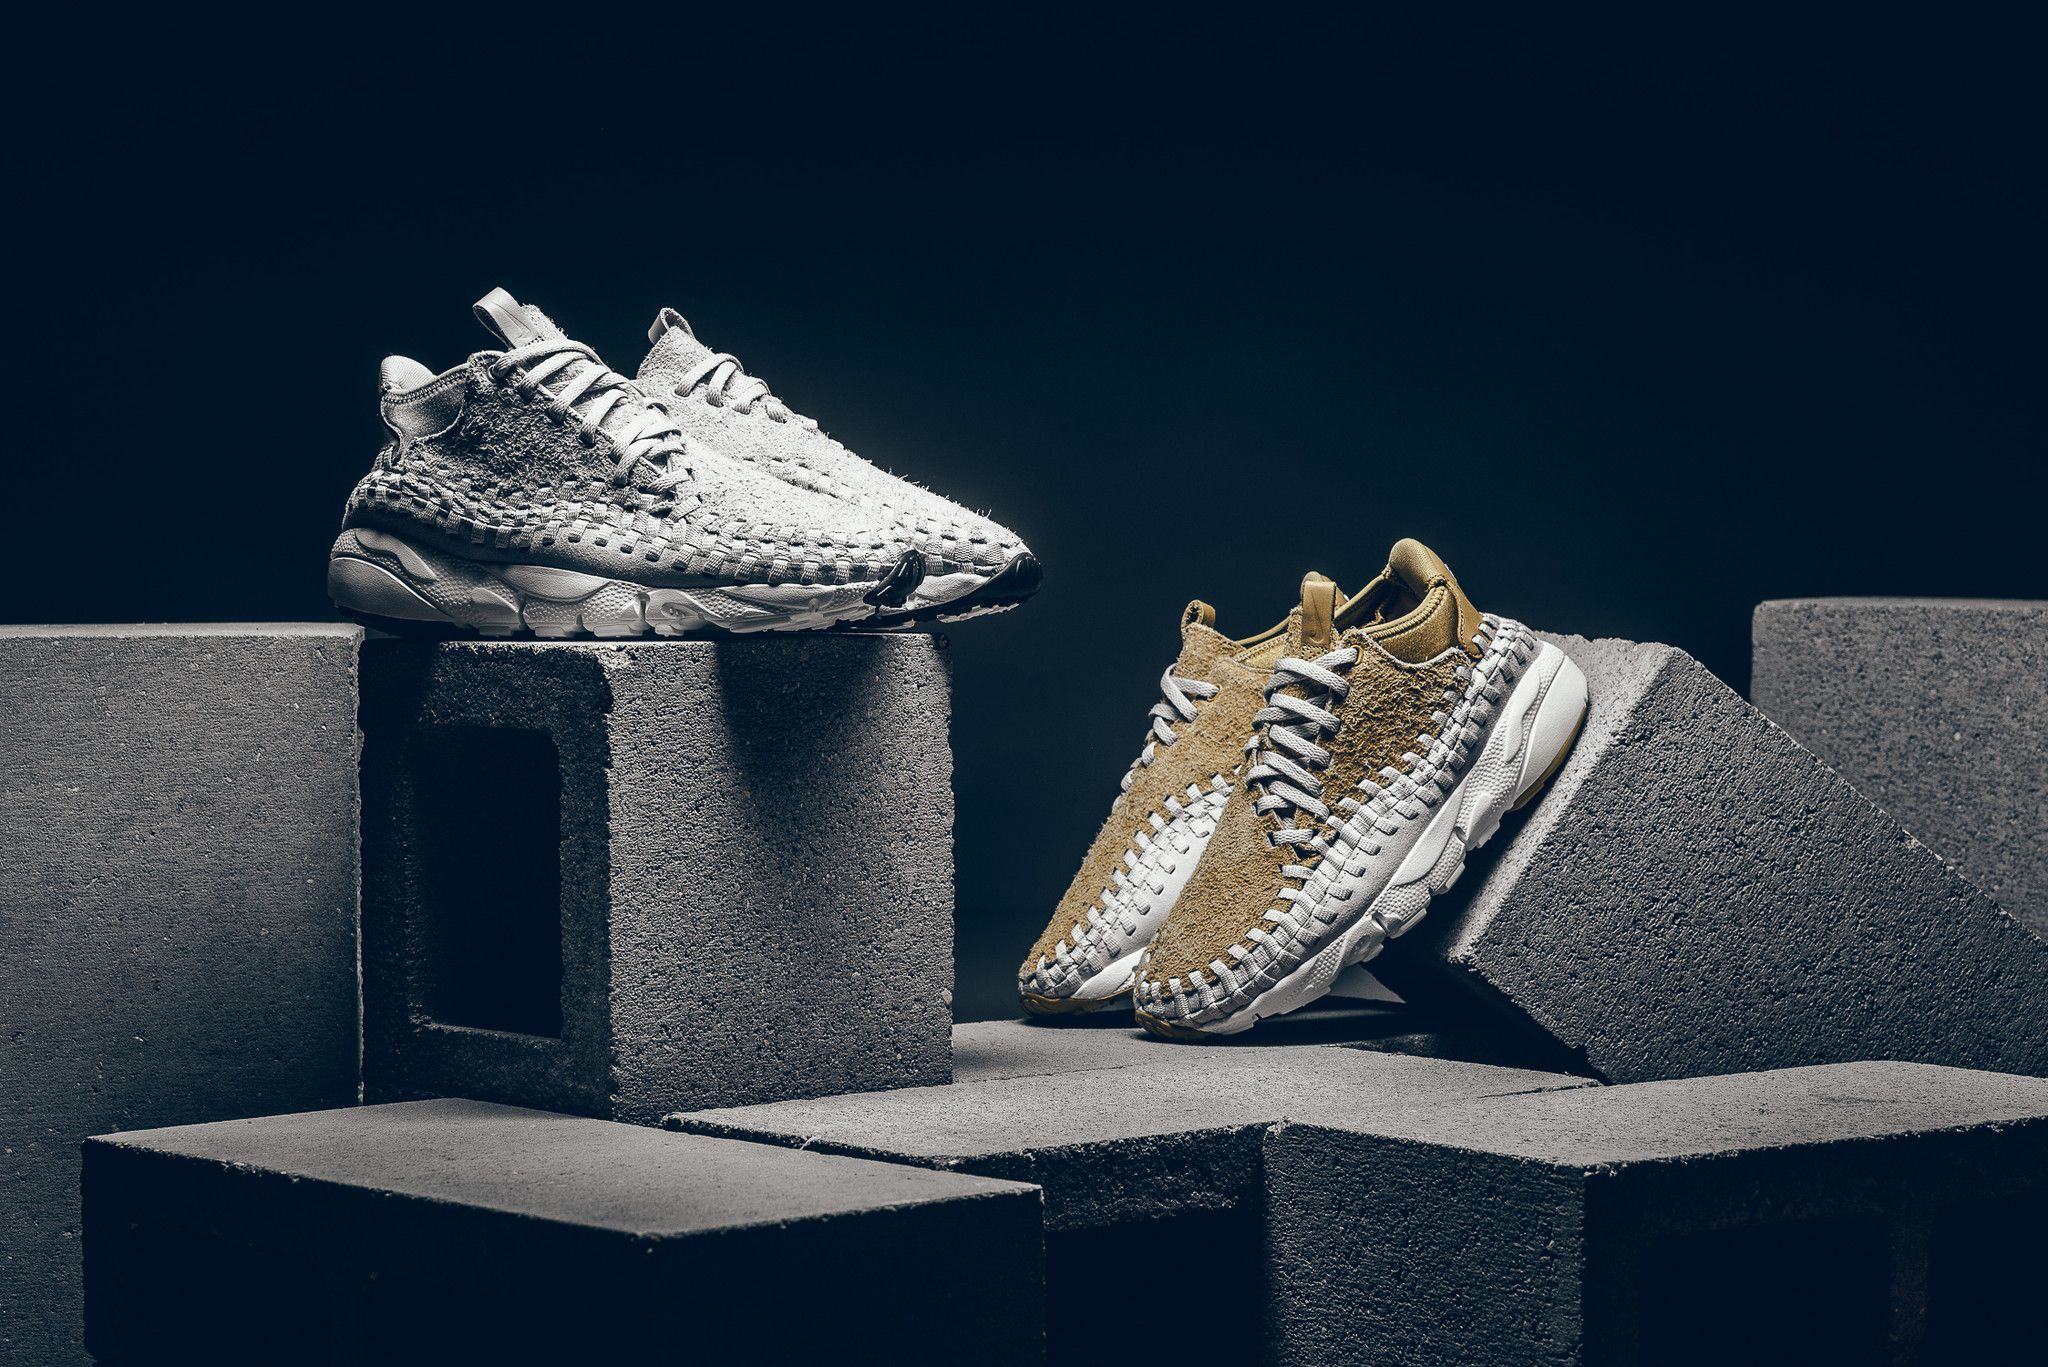 new concept 8faf6 641df ... Nike Air Footscape Woven Chukka QS - Flat GoldLight Orewood Brown -  Sneaker Politics .